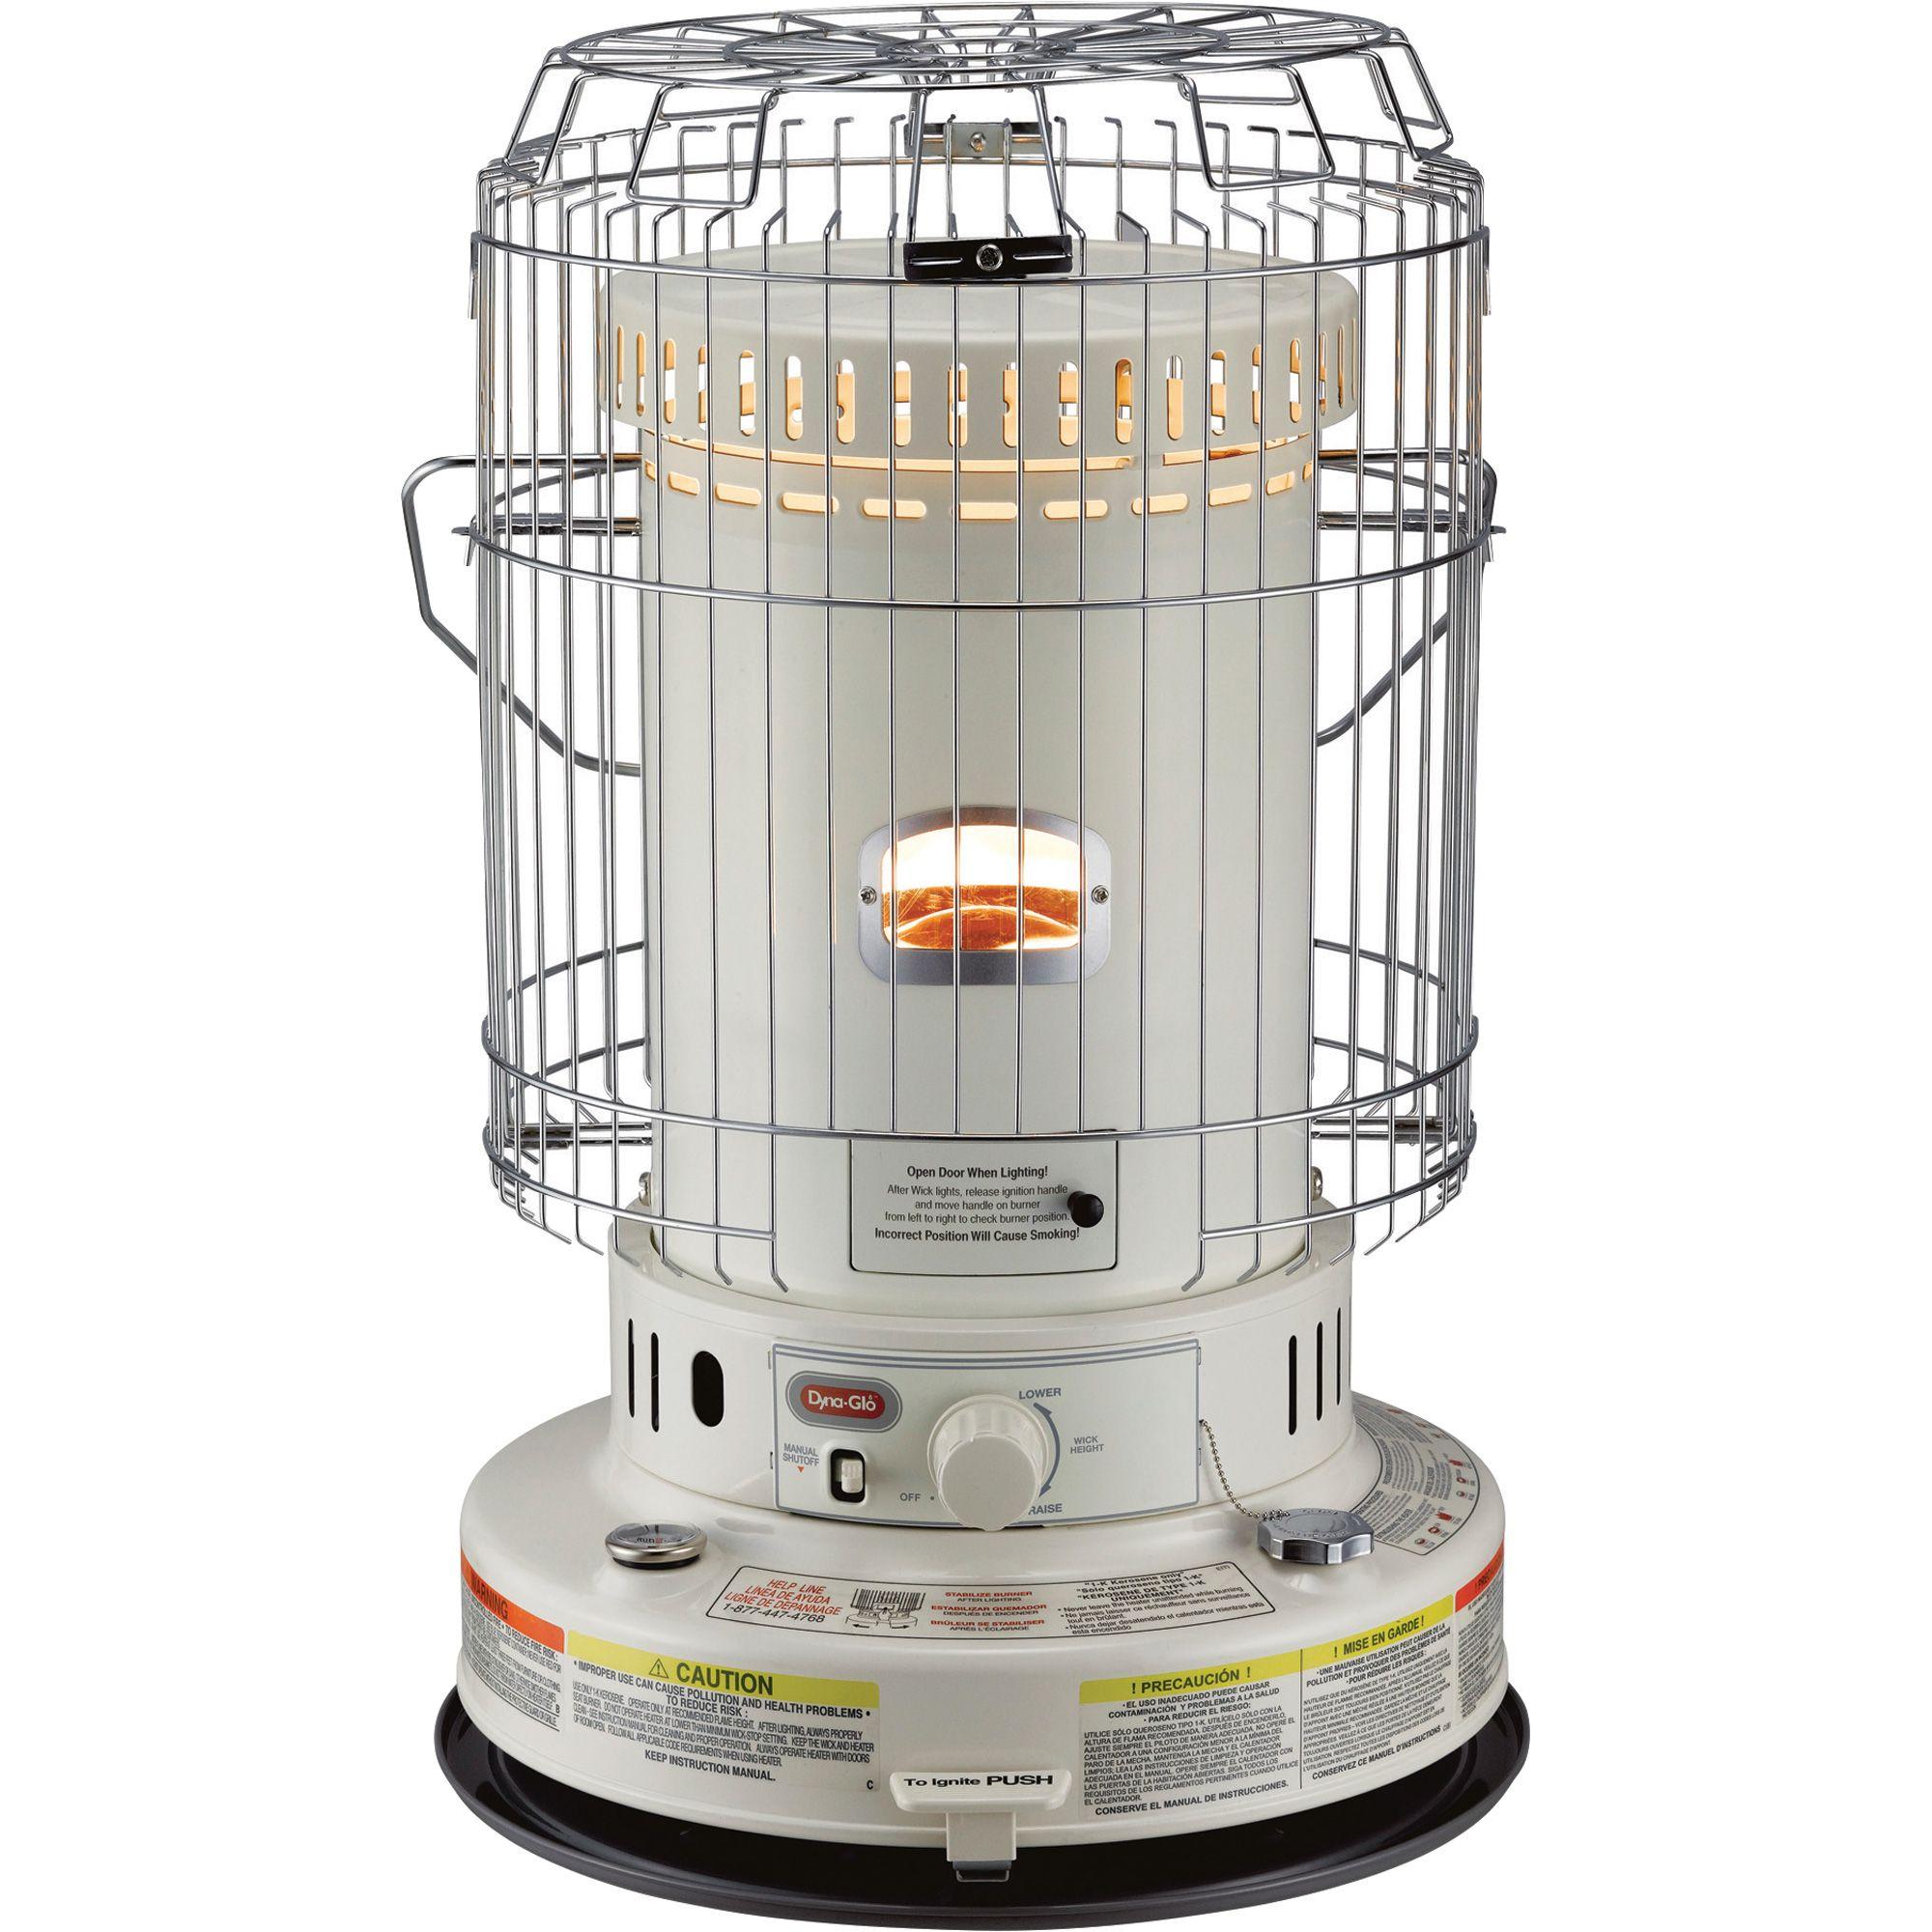 DynaGlo Indoor Kerosene Convection Heater 23,800 BTU